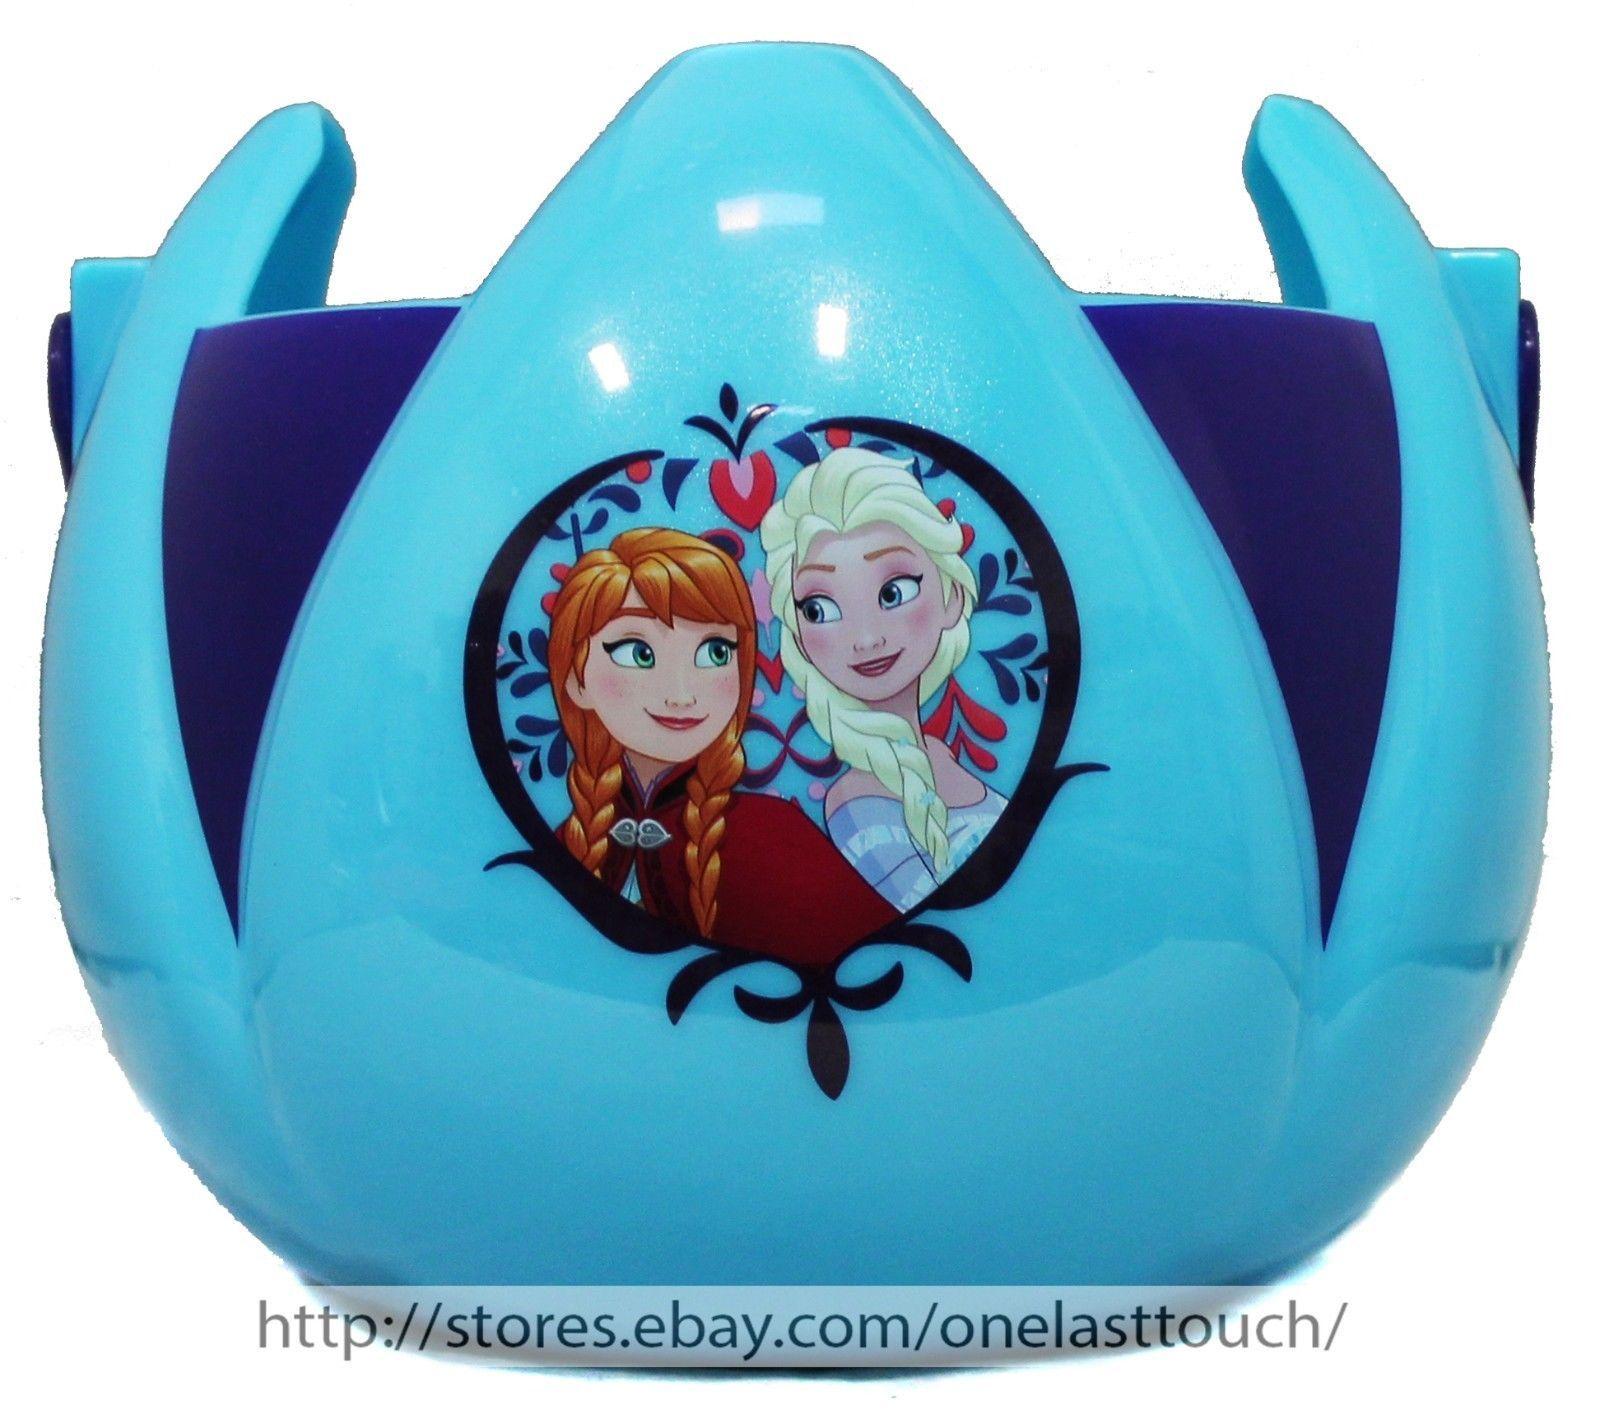 PTI*Candy Basket DISNEY FROZEN Hard Plastic EASTER/HALLOWEEN Light Blue+Navy 1/9